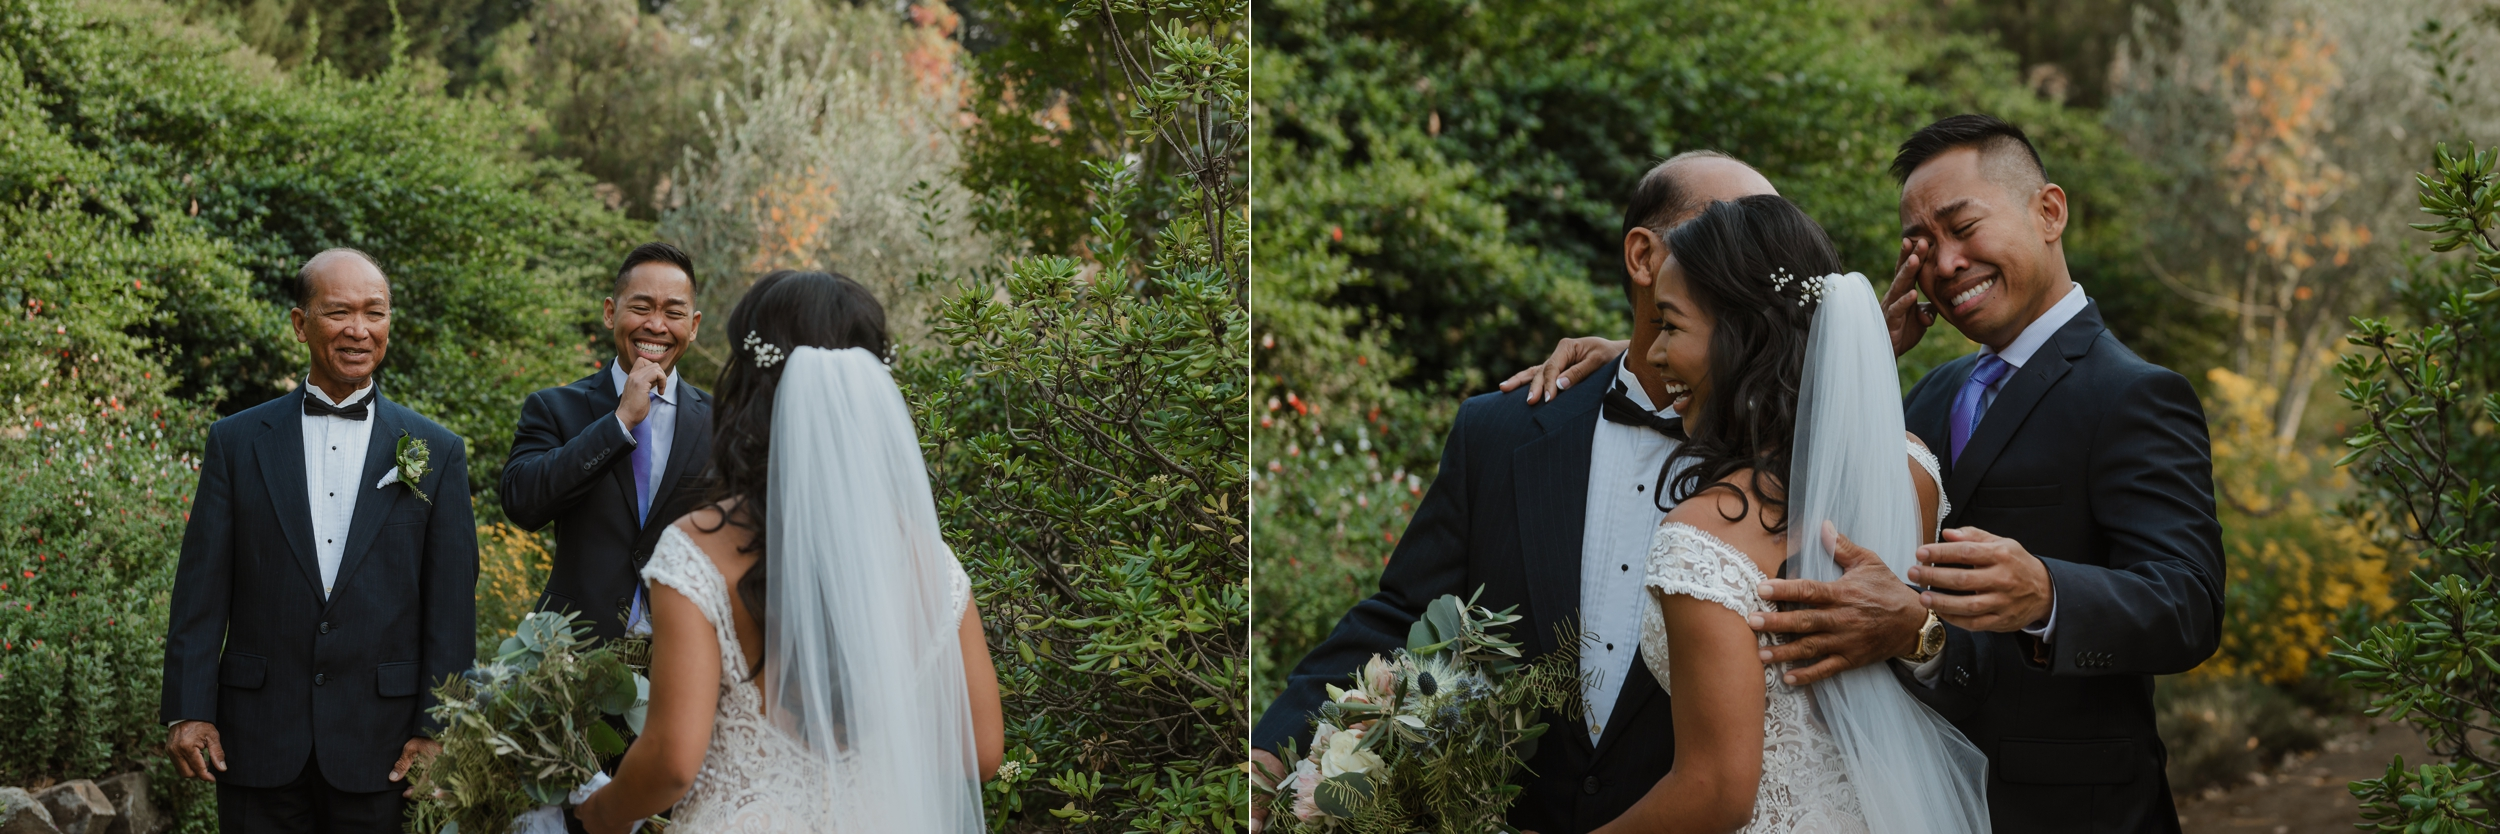 017marin-petaluma-backyard-wedding-vivianchen-135_WEB.jpg